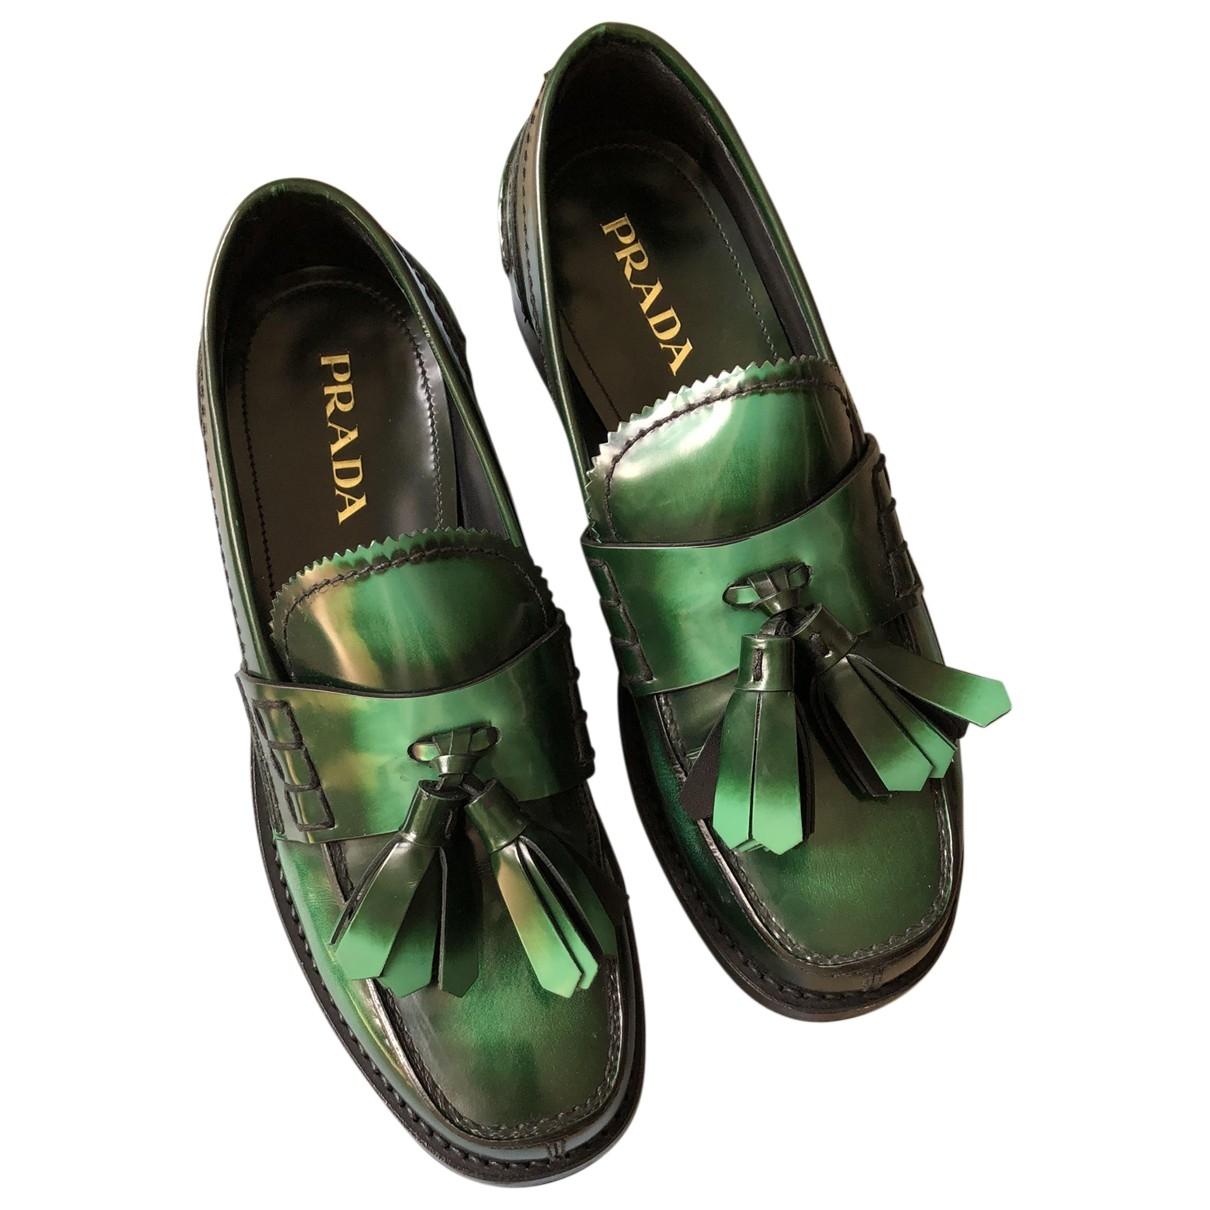 Prada \N Green Patent leather Flats for Women 37 EU